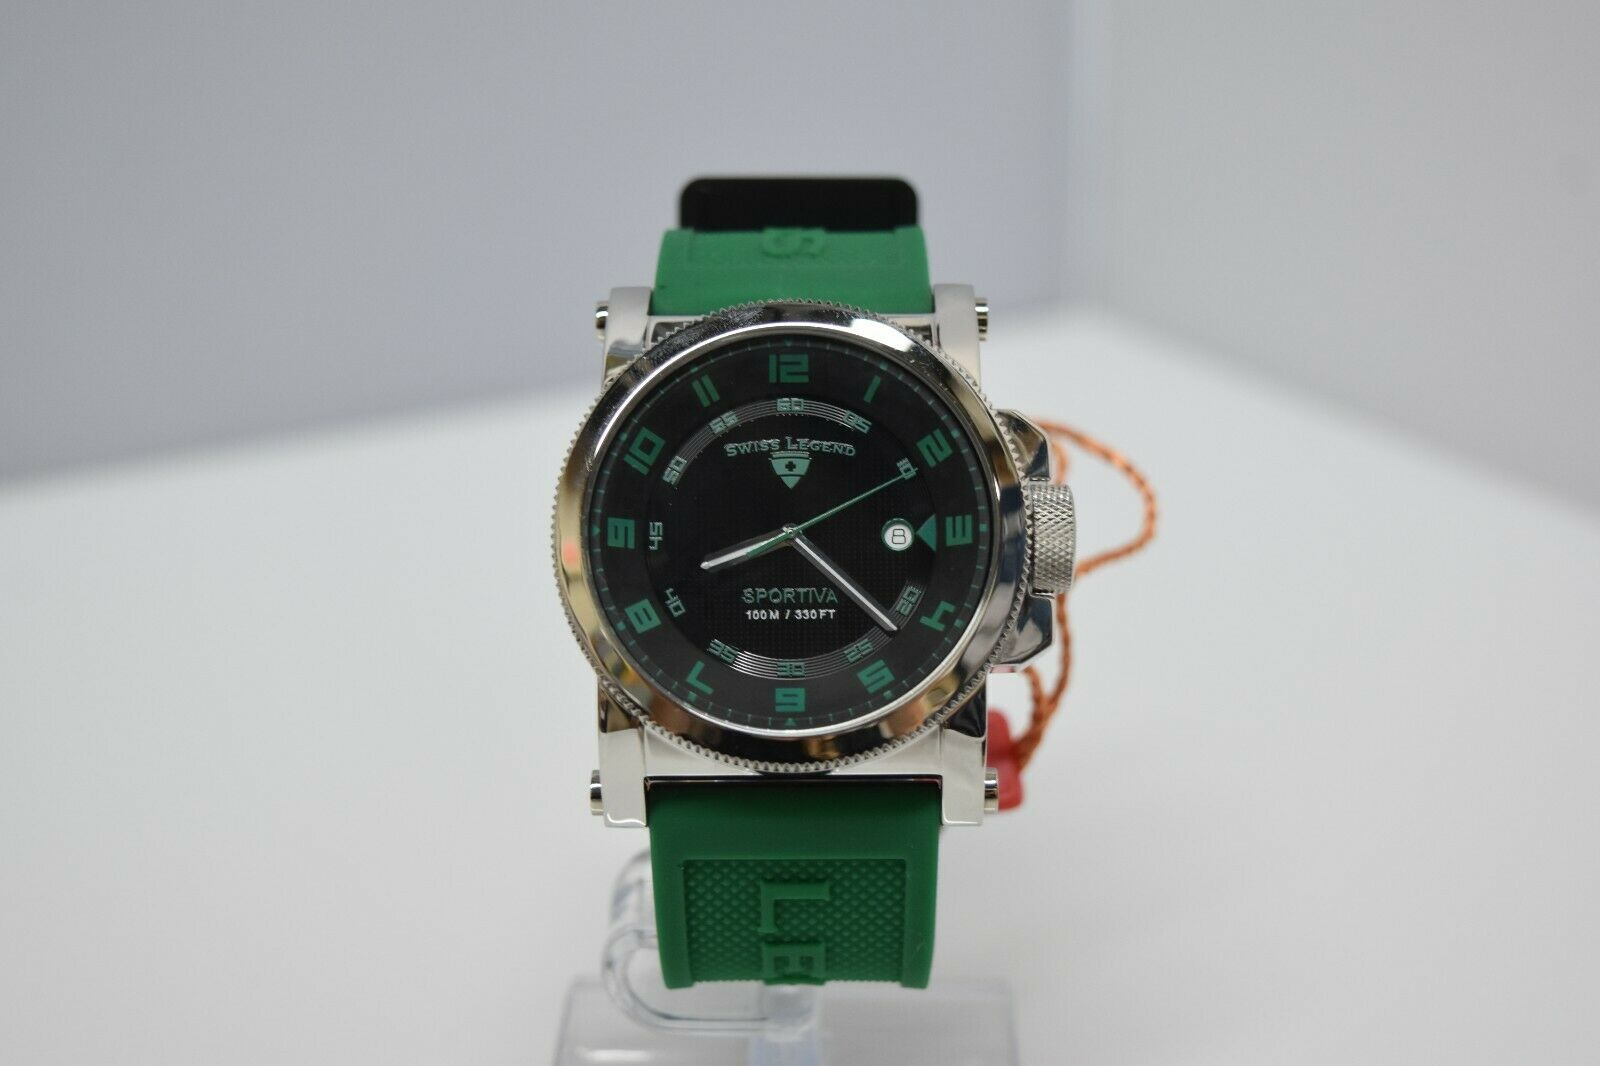 Swiss Legend Sportiva 45mm SL-40030 Watch Green/Black